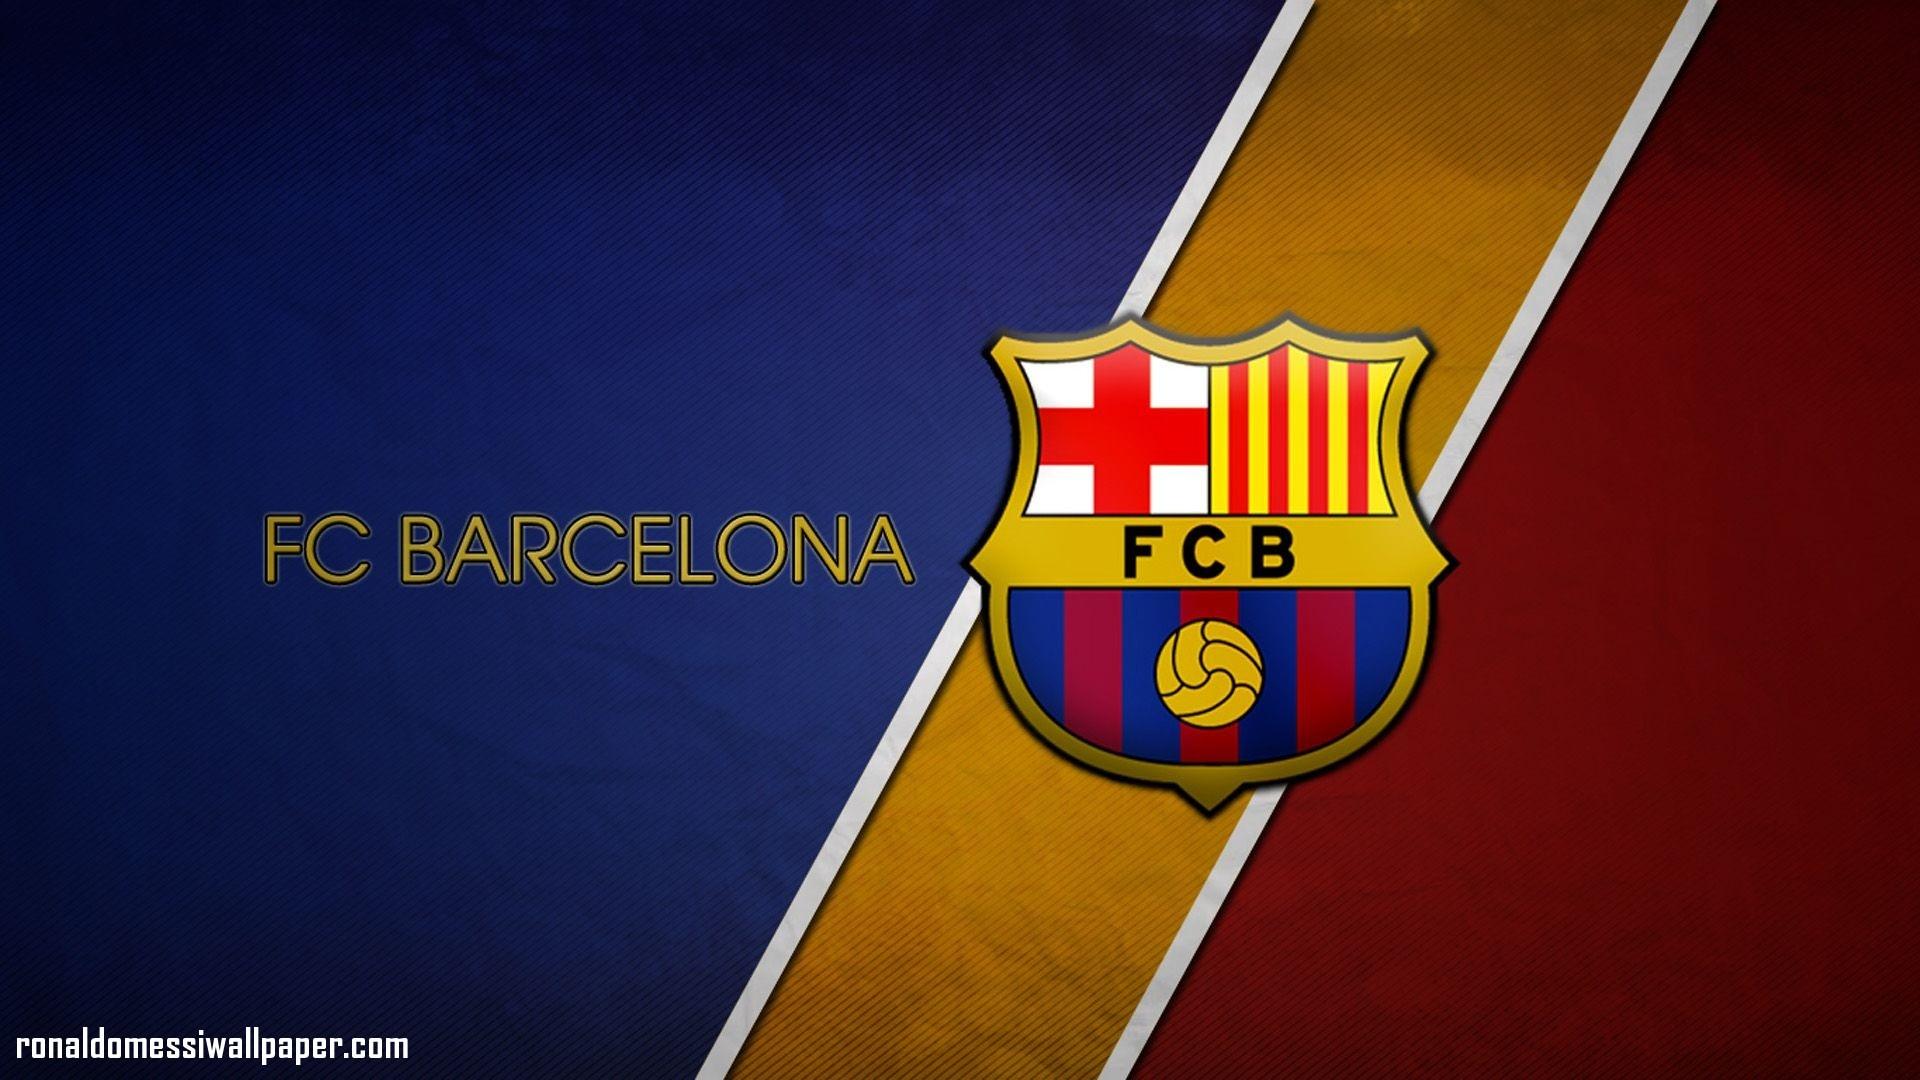 Hd Barcelona Wallpapers Wallpaper Hd